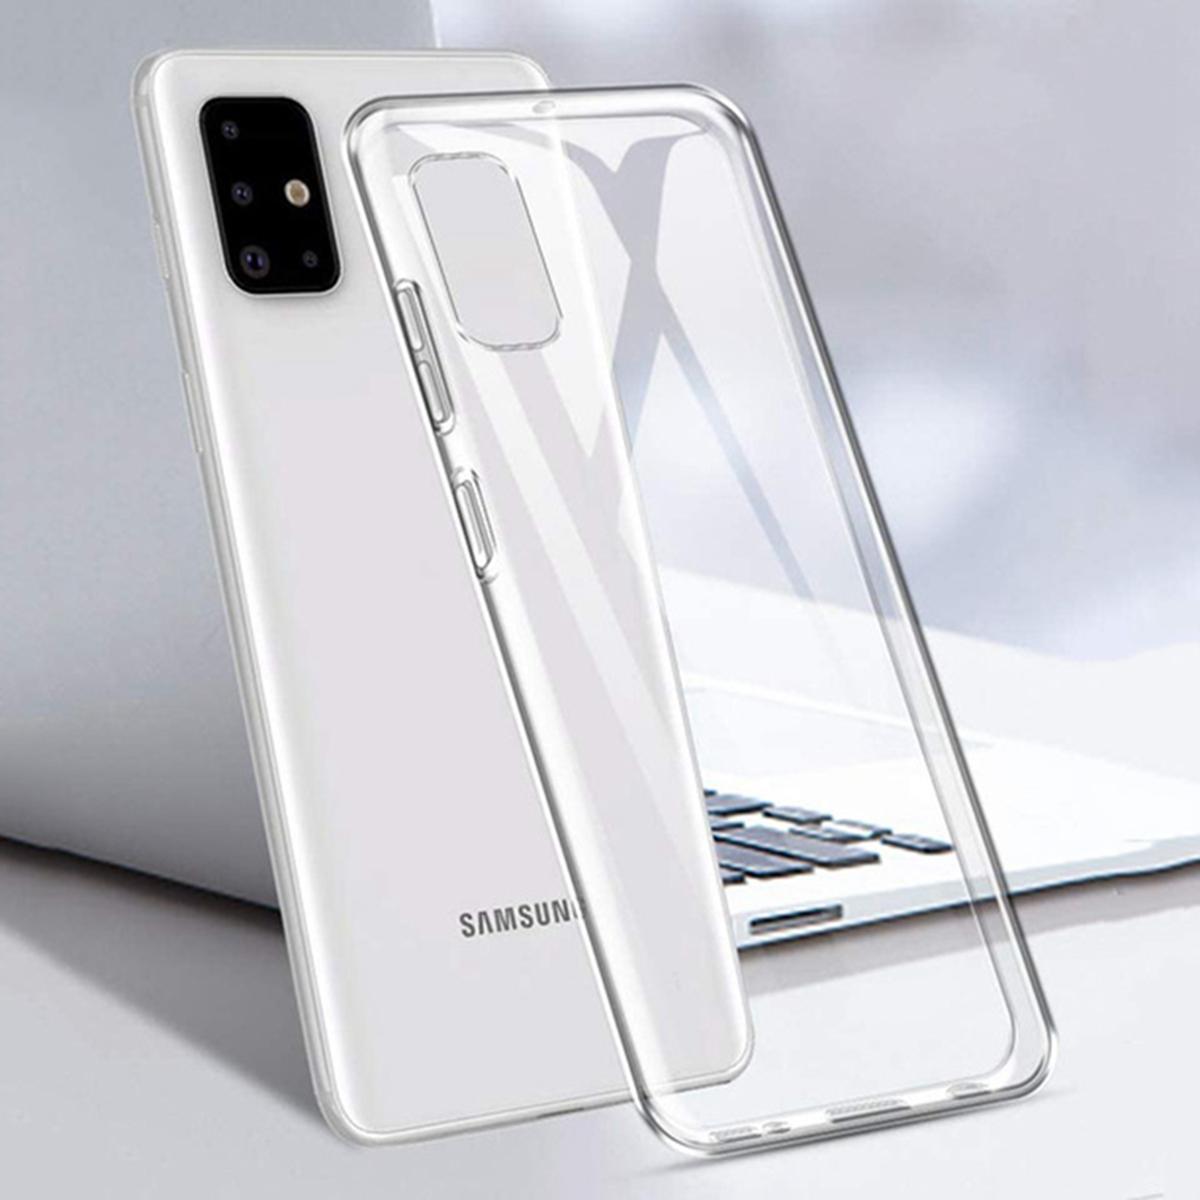 Samsung Galaxy Note20 Için Ultra S20 + Clear Yumuşak Silikon TPU Kılıfı Arka Kapak Sararma Not10 + Note9 S10 + S9 + Huawei Mate40 Pro + P40